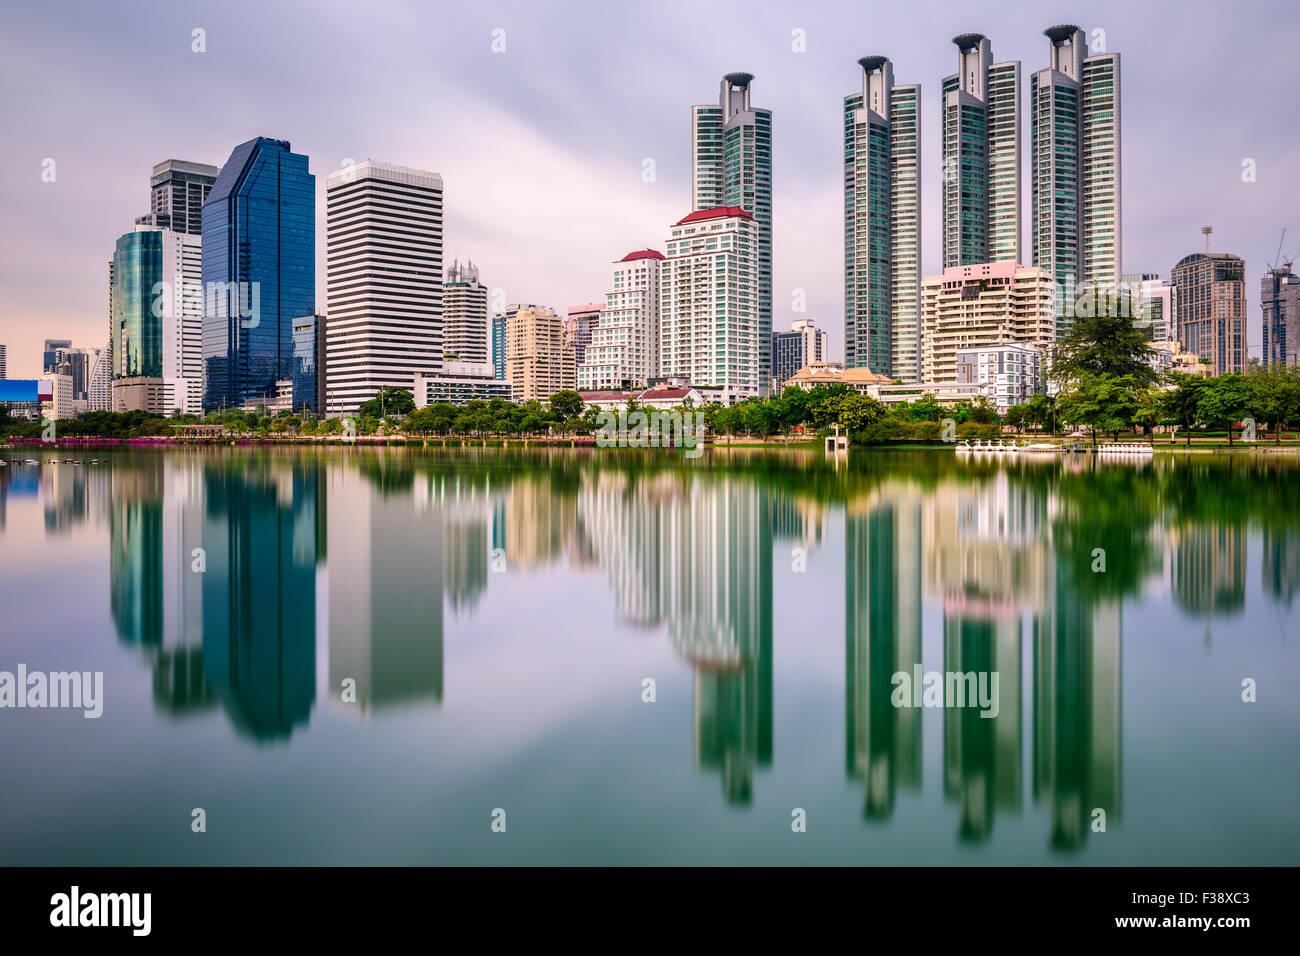 Bangkok, Thailand skyline from Benjakiti Park. - Stock Image